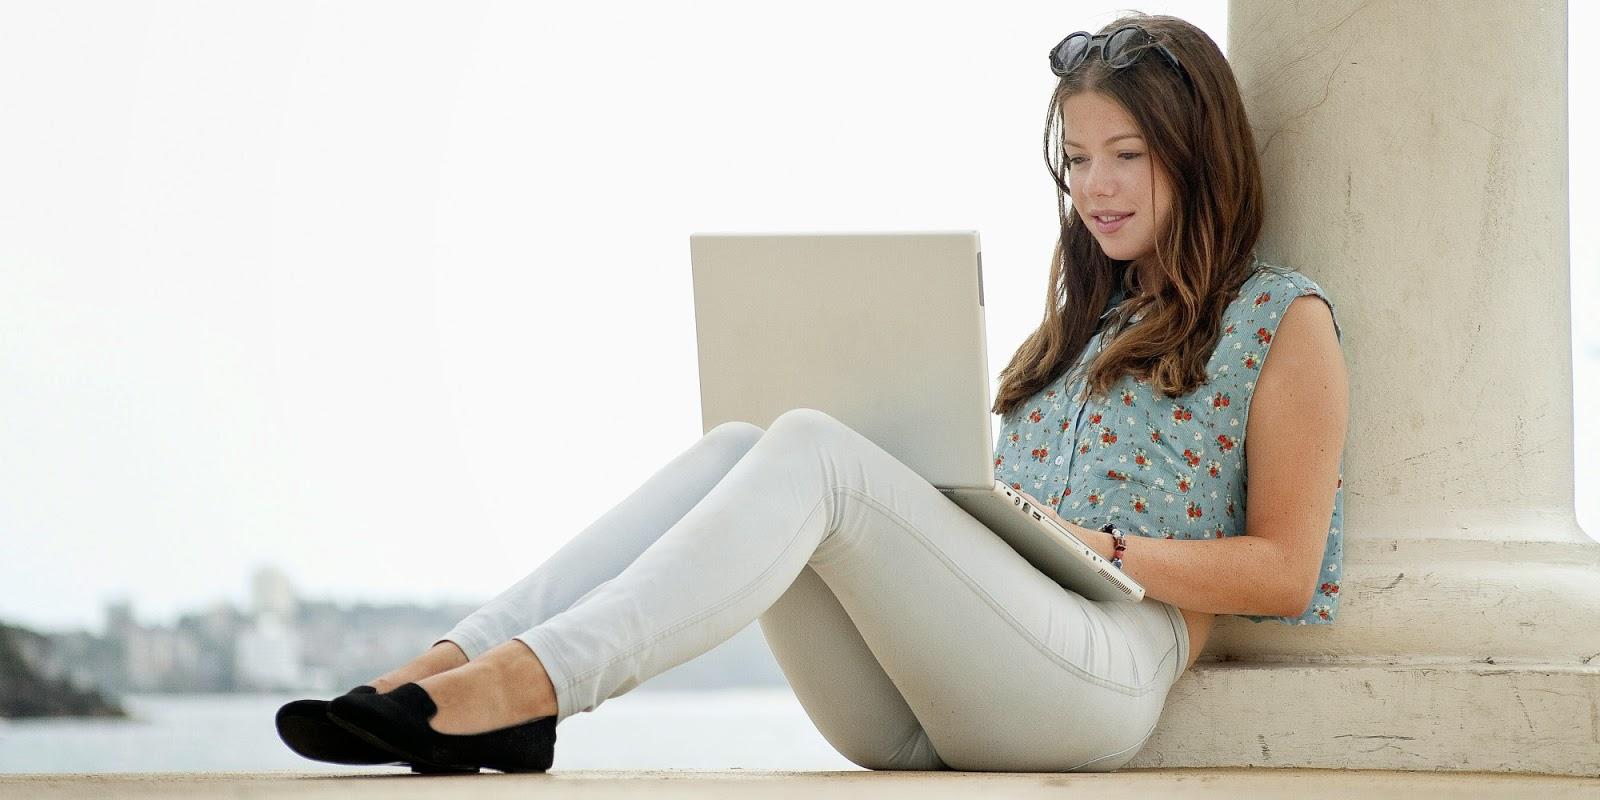 Чат девушек онлайн 2 фотография